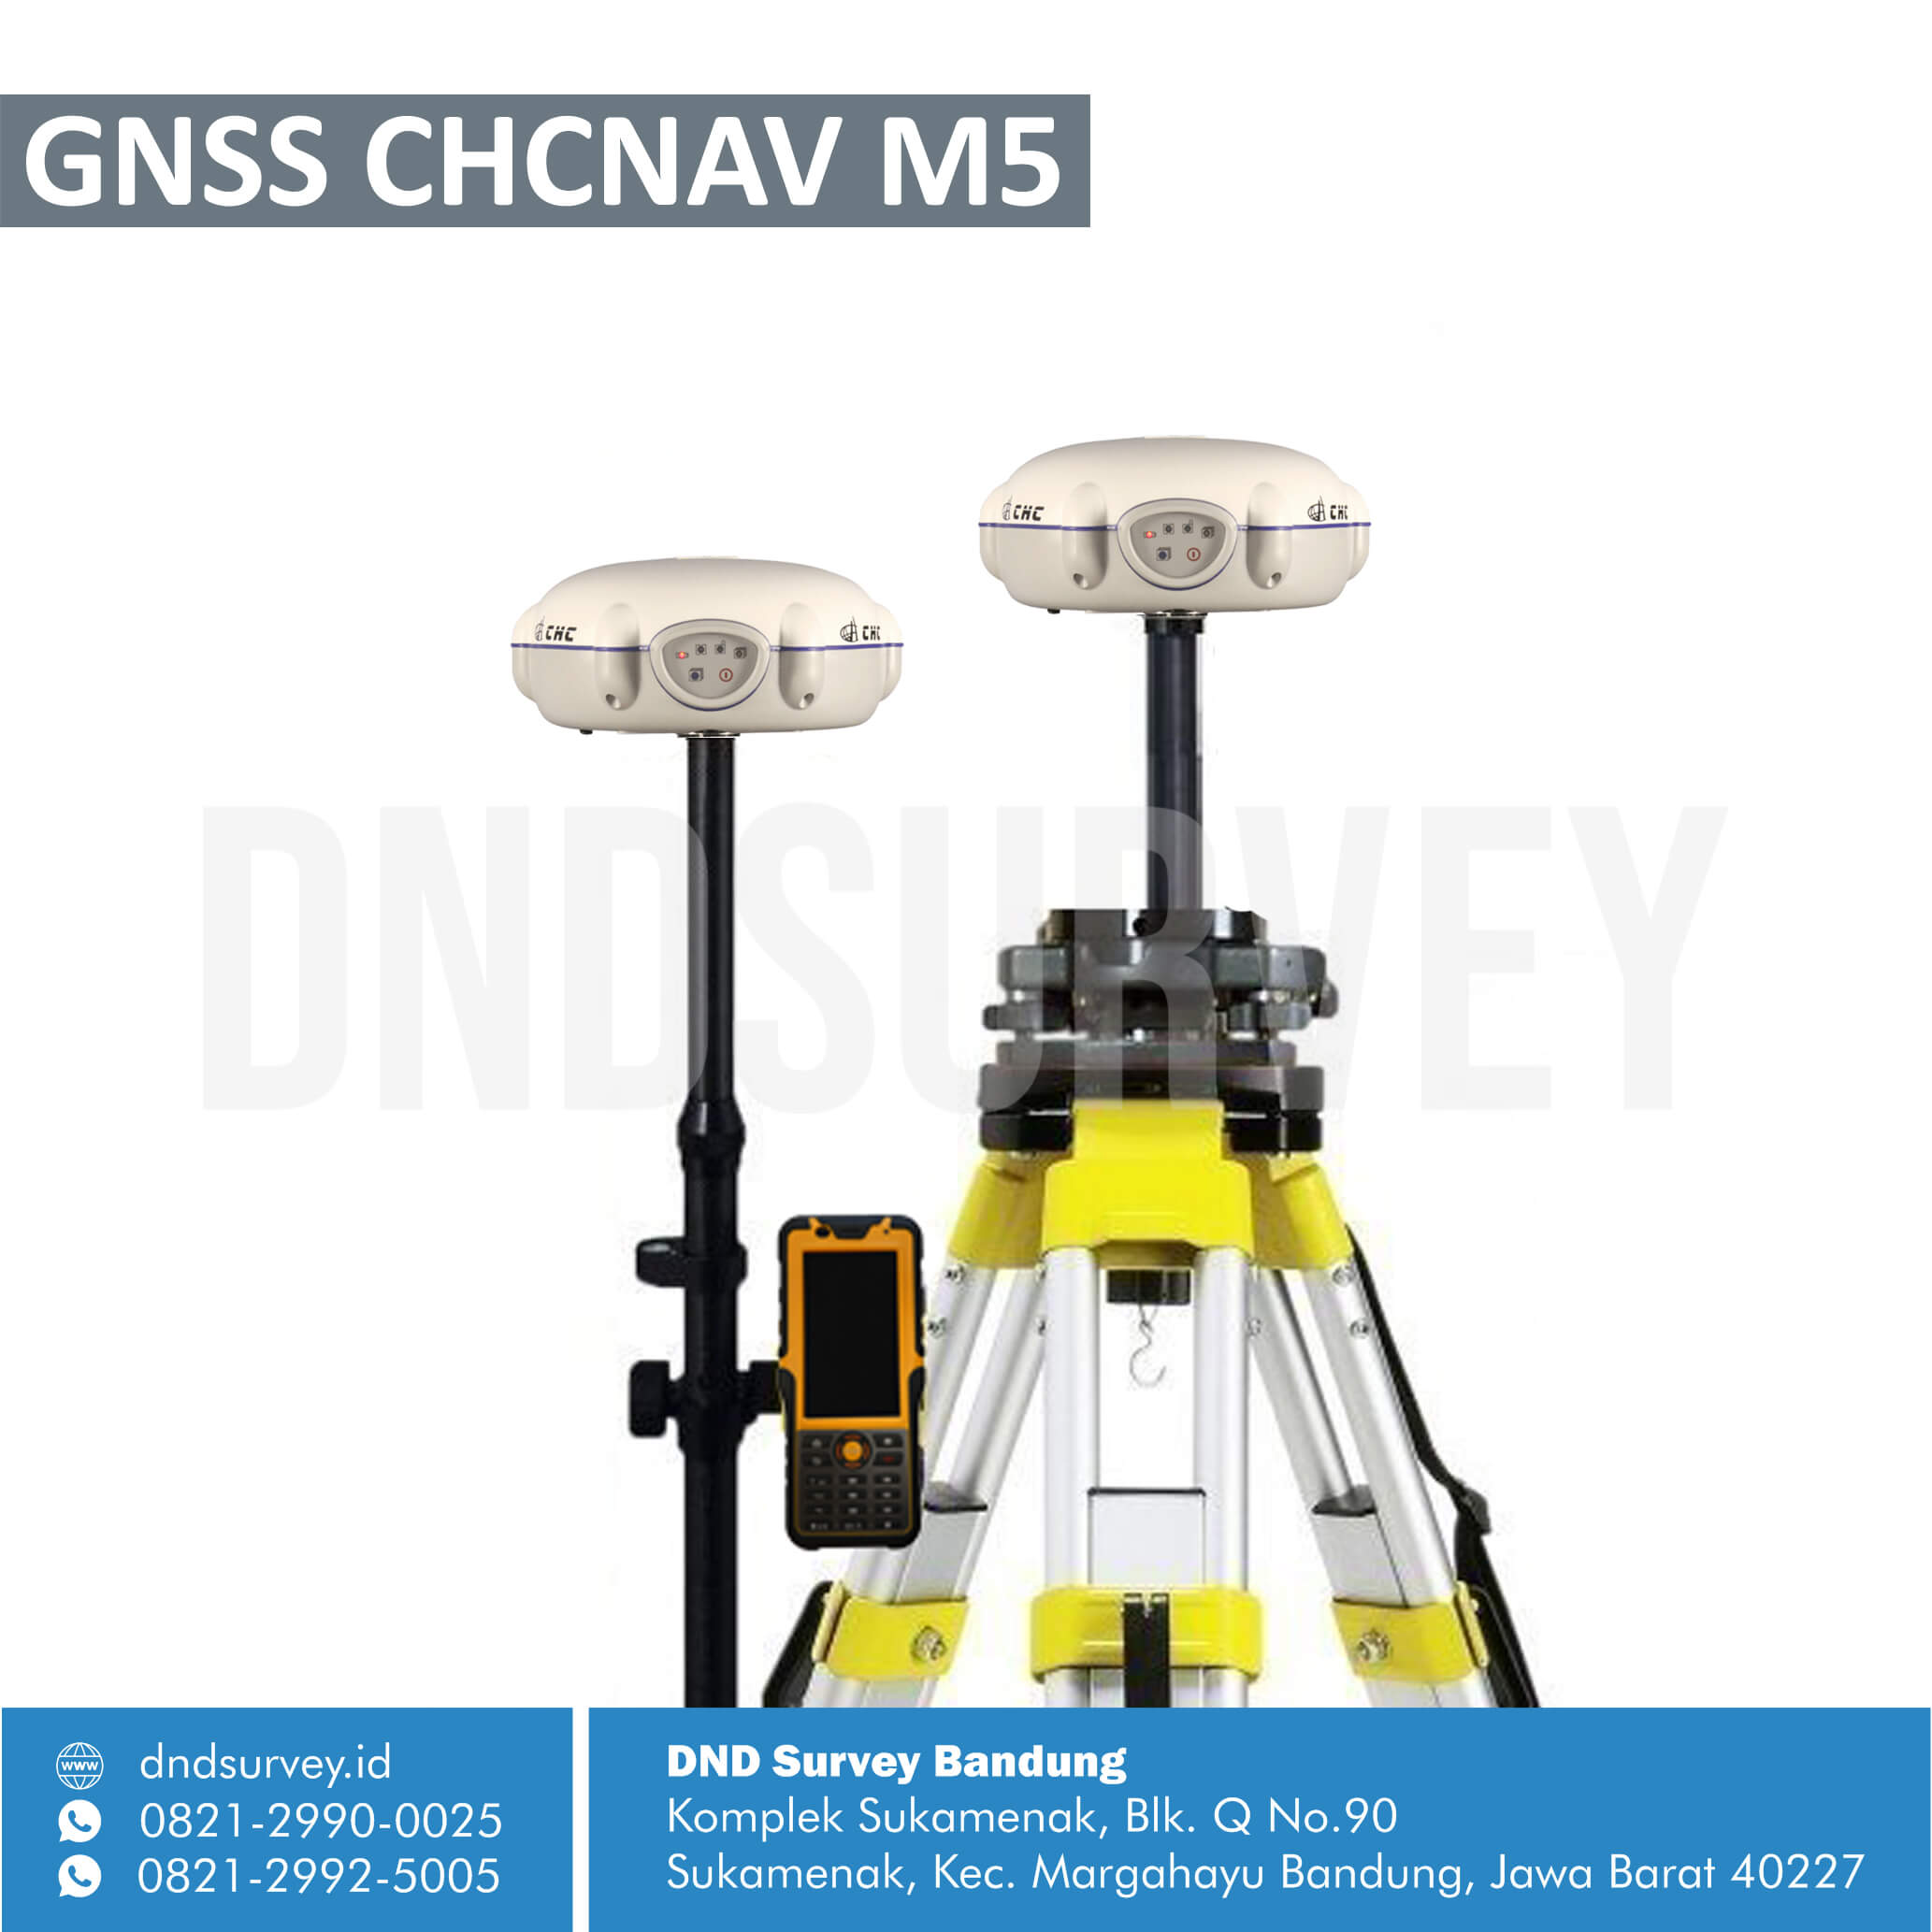 GNSS CHCNAV M5